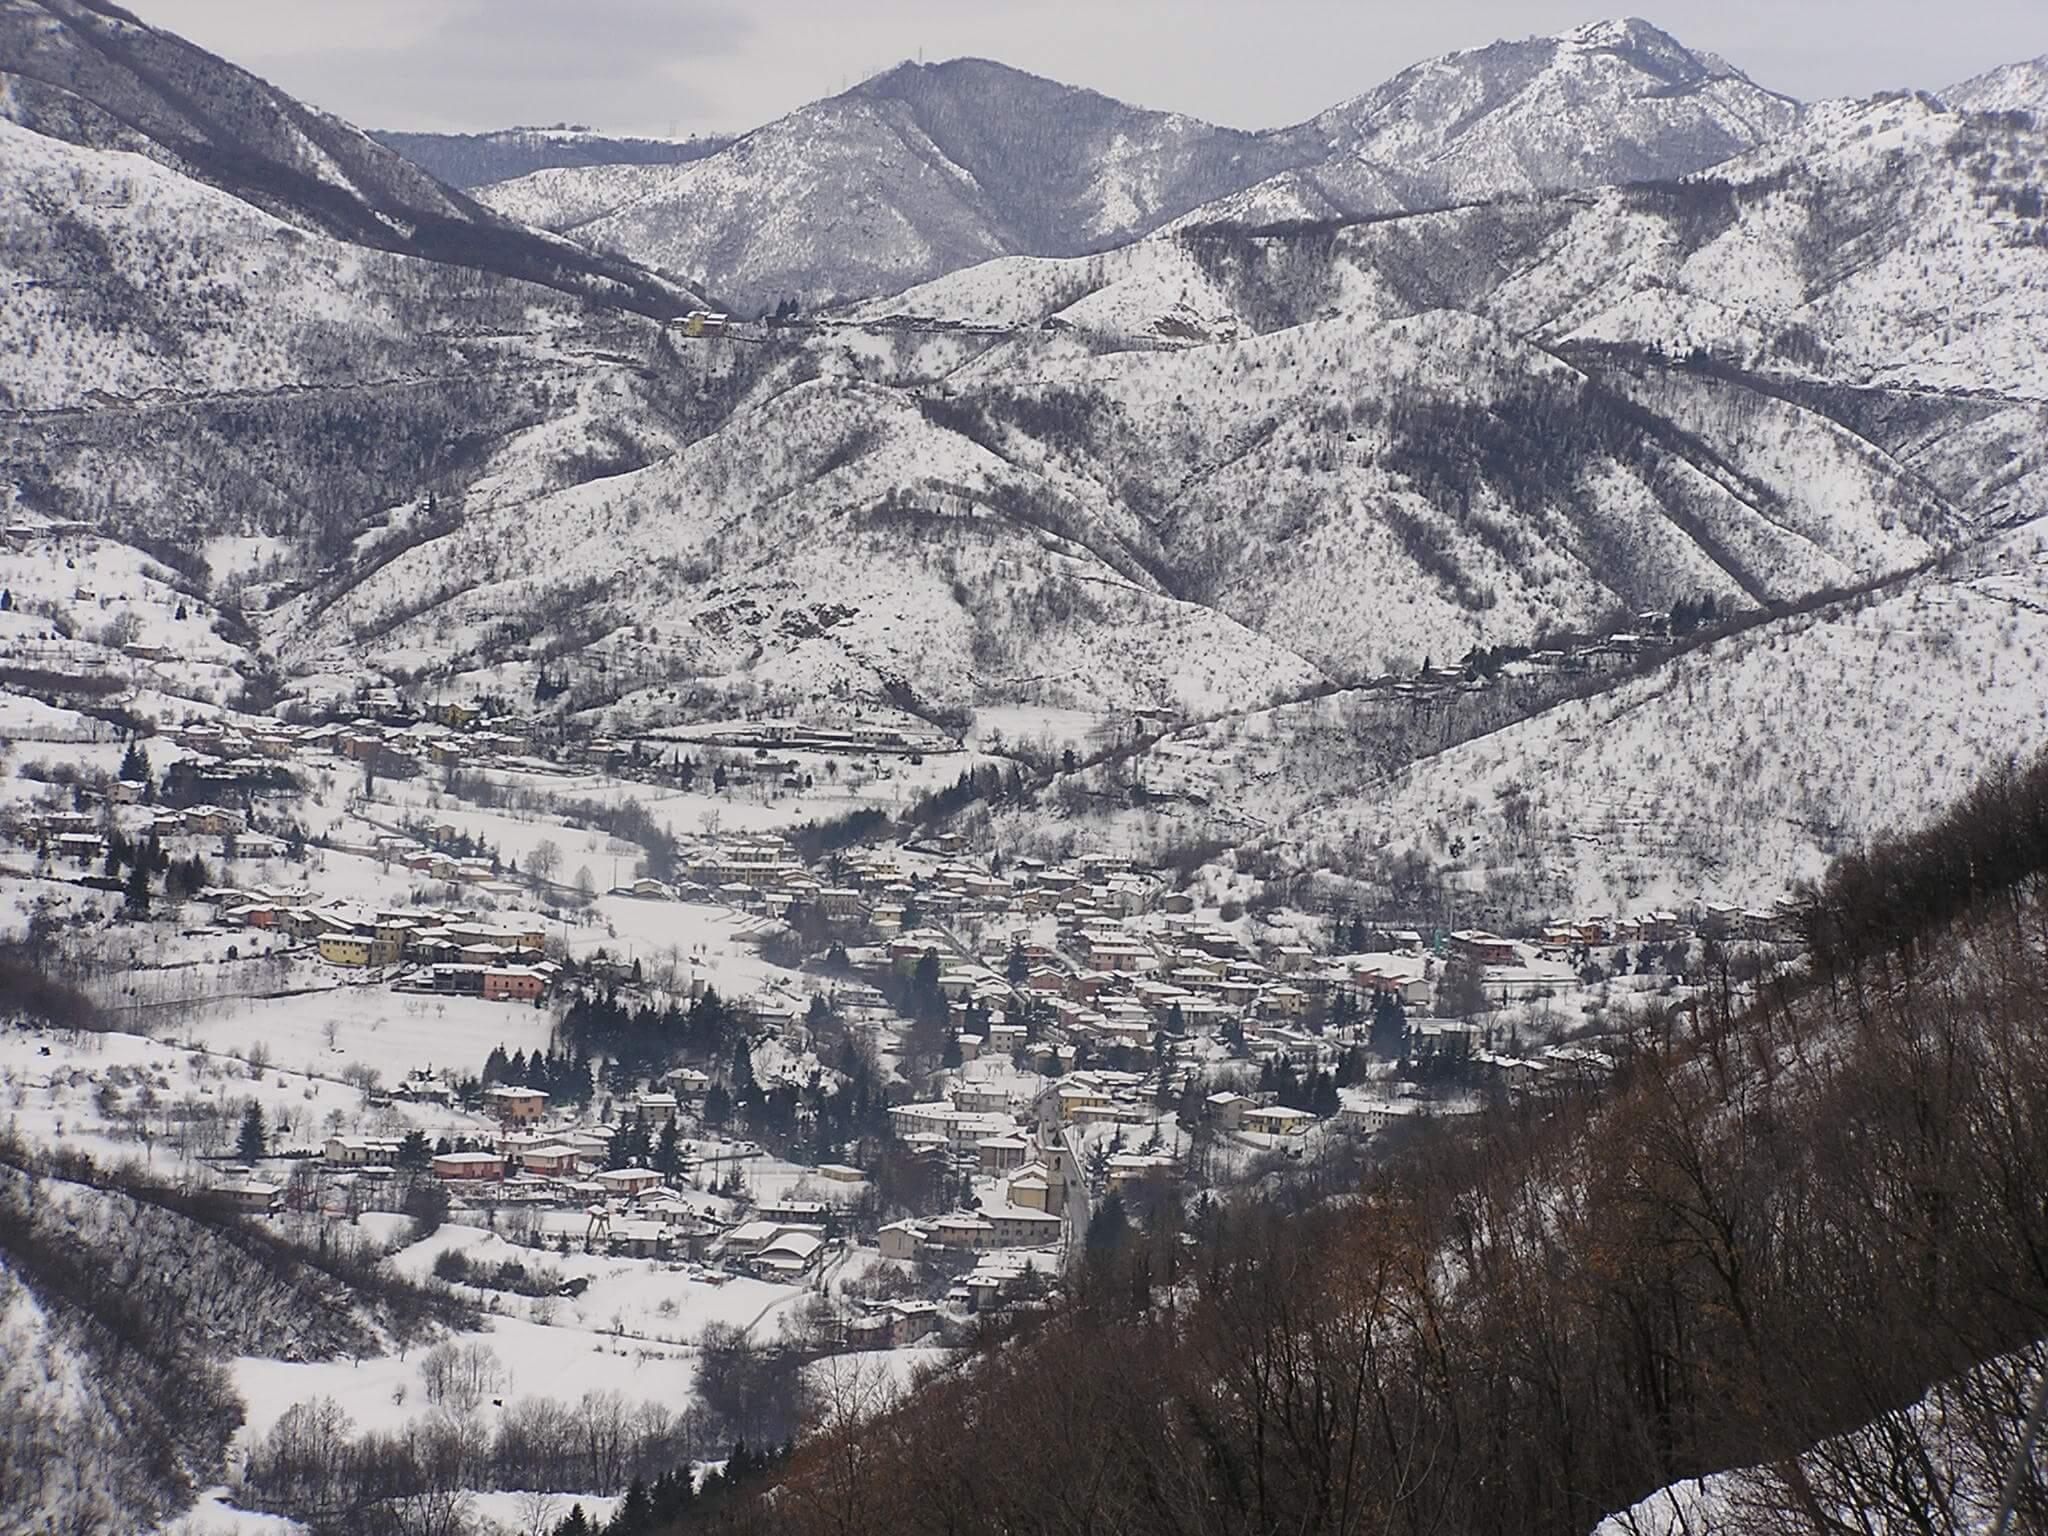 Case vacanze in affitto a Vallio Terme